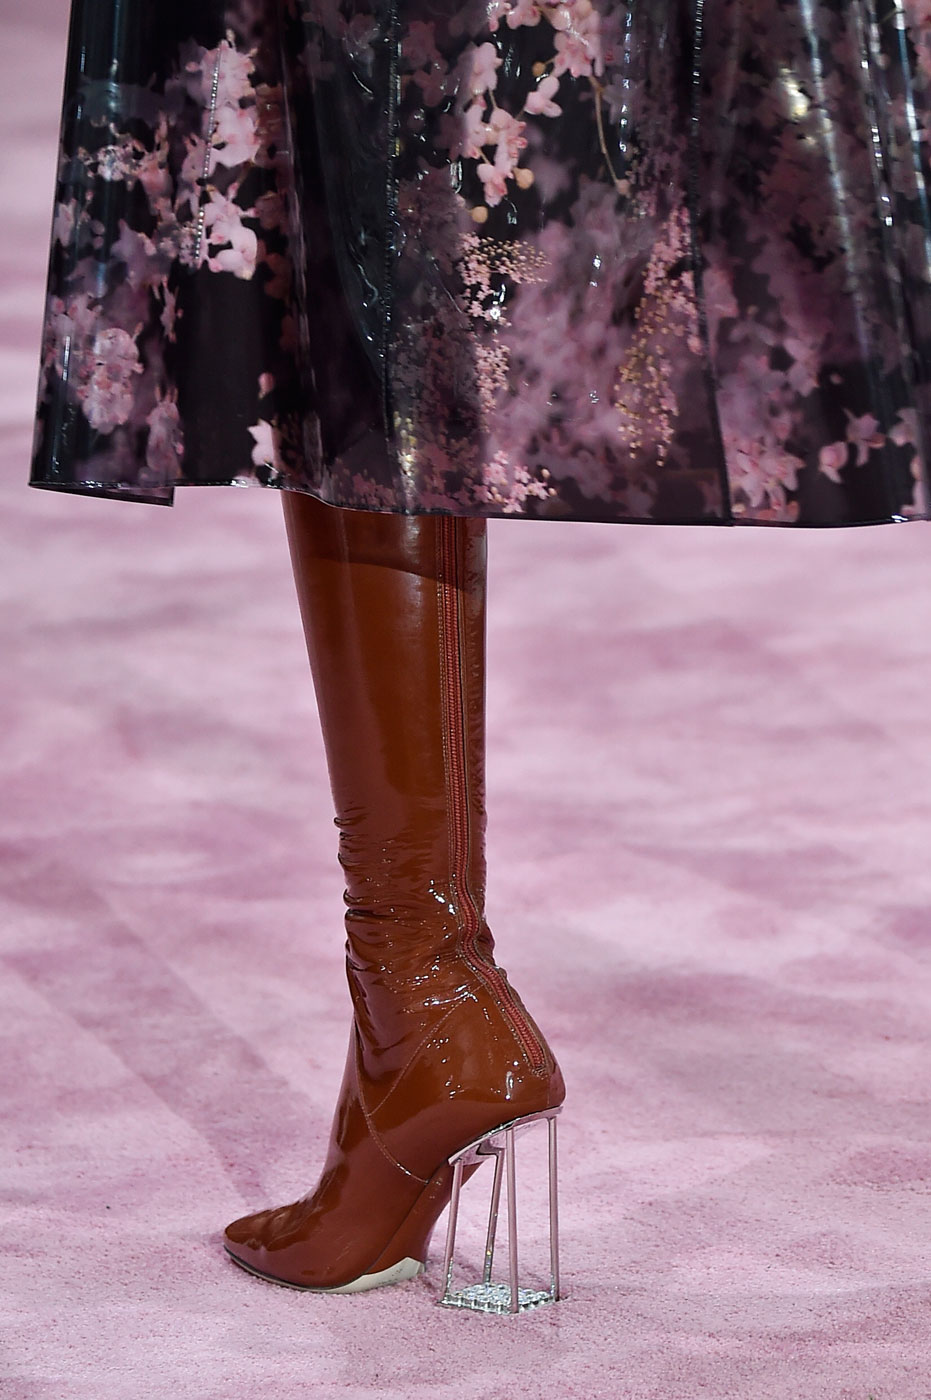 Christian-Dior-fashion-runway-show-close-ups-haute-couture-paris-spring-summer-2015-the-impression-005